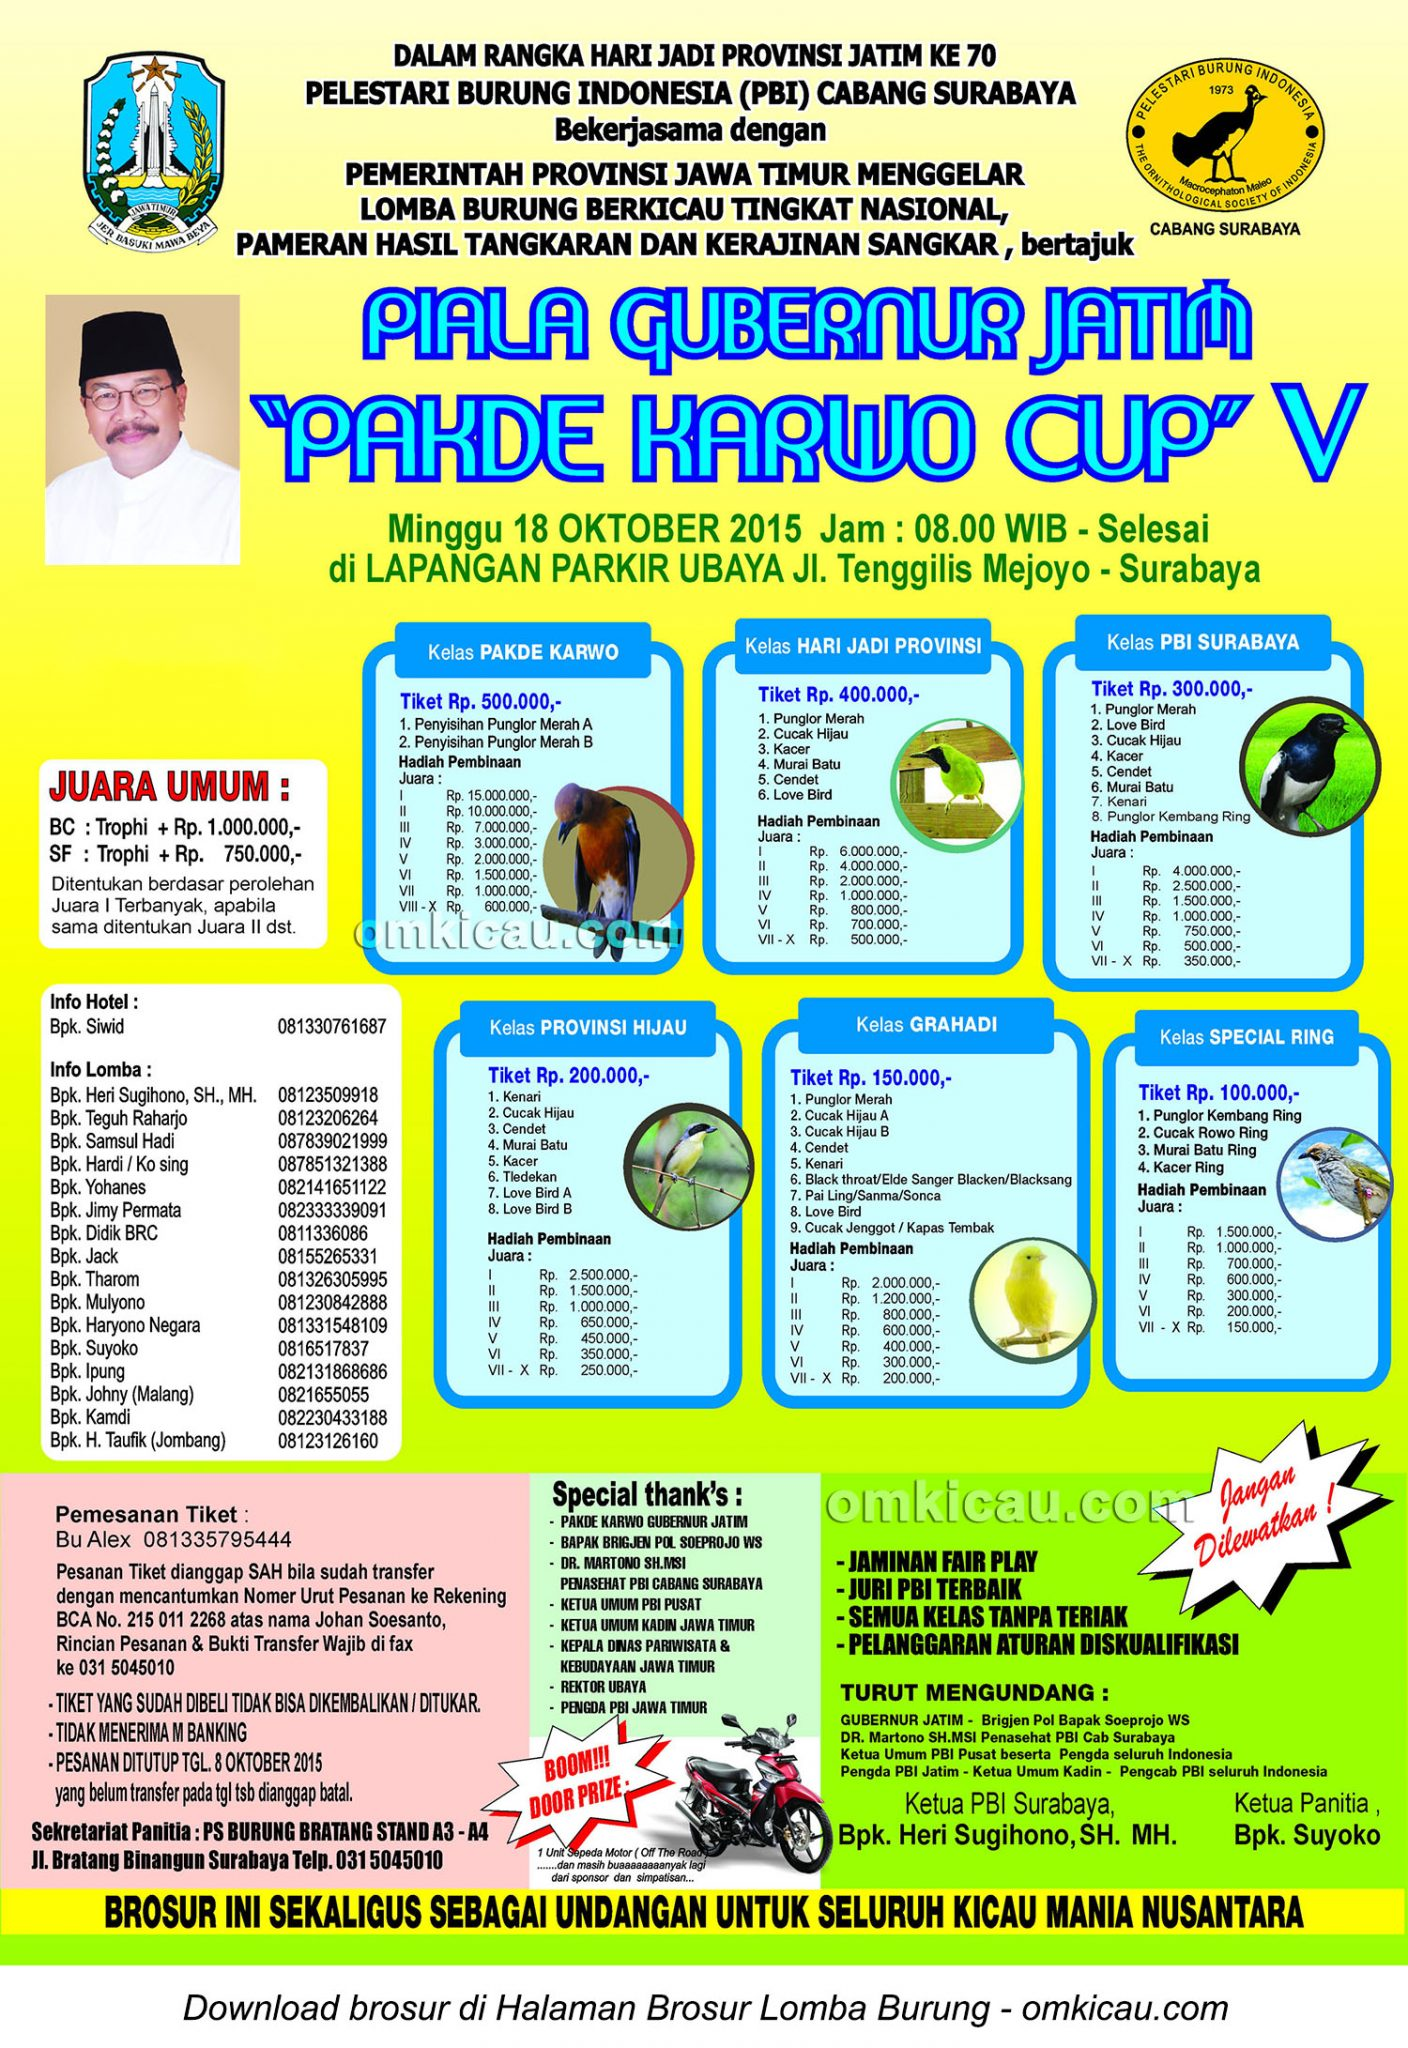 Brosur Lomba Burung Berkicau Pakde Karwo Cup V, Surabaya, 18 Oktober 2015